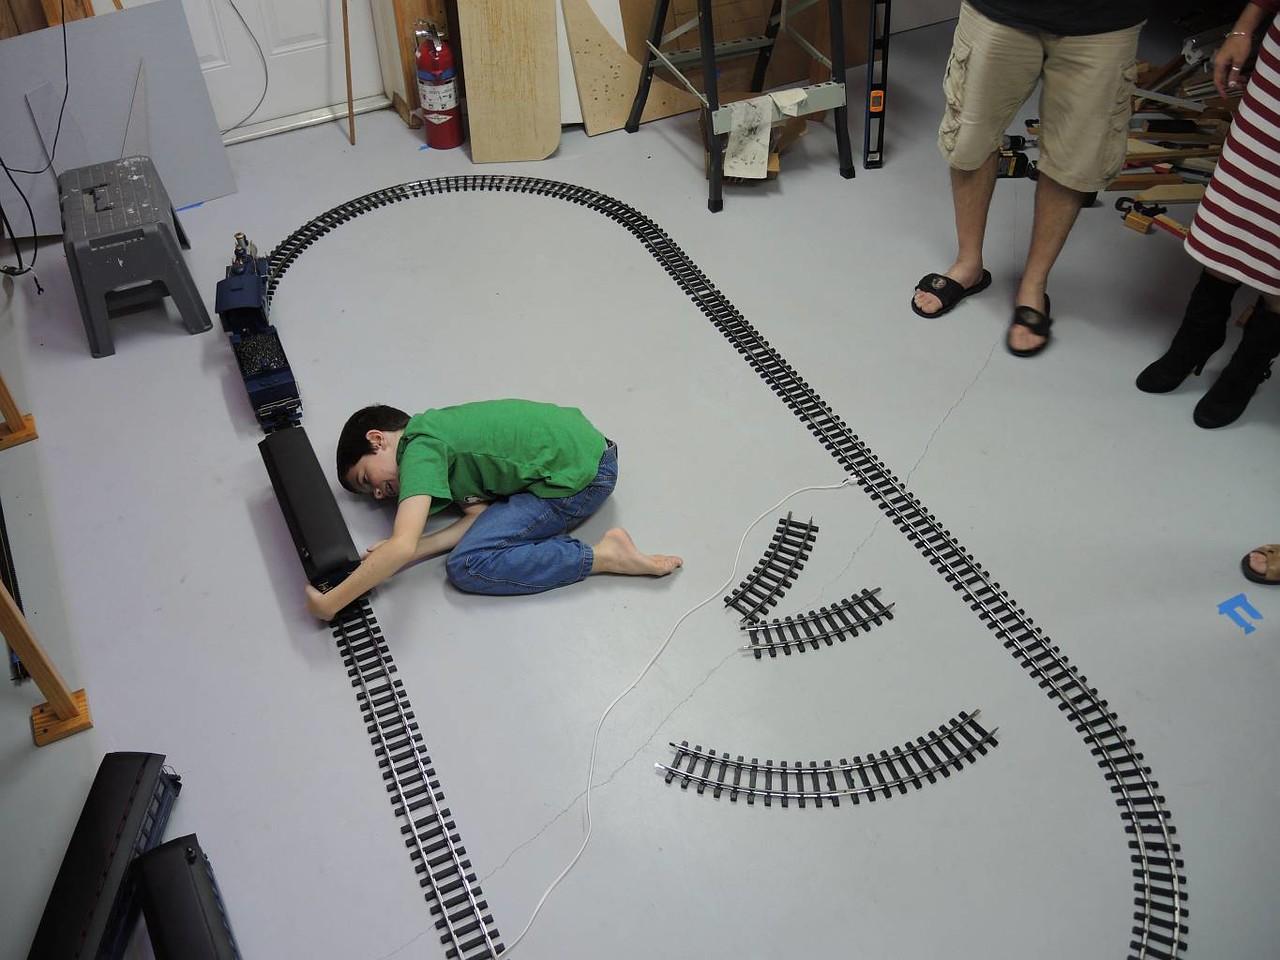 AFTER dinner, Ben finally got a chance to set up his new train set! WOW!